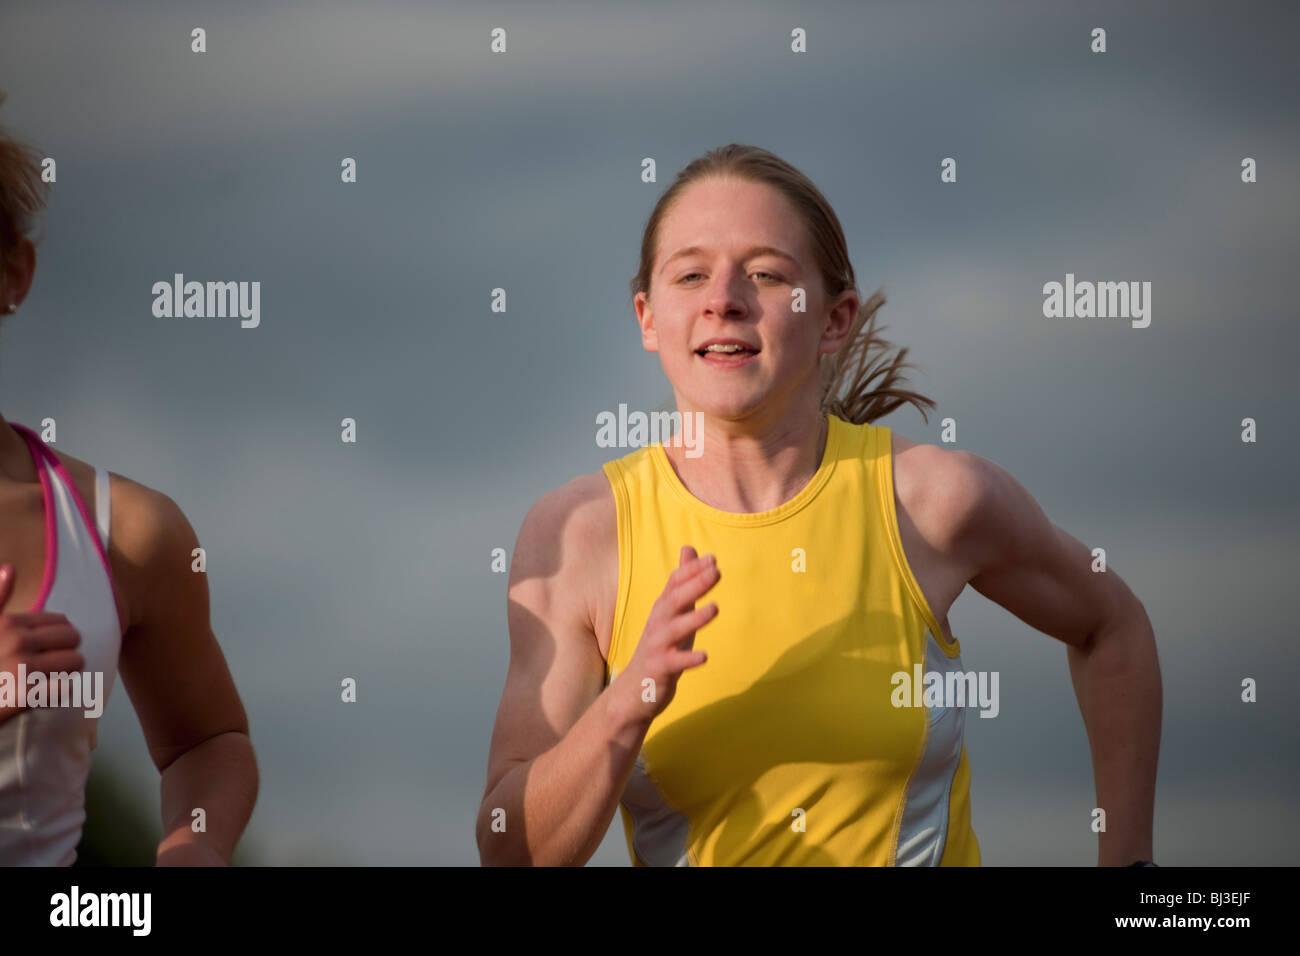 female athlete competing - Stock Image